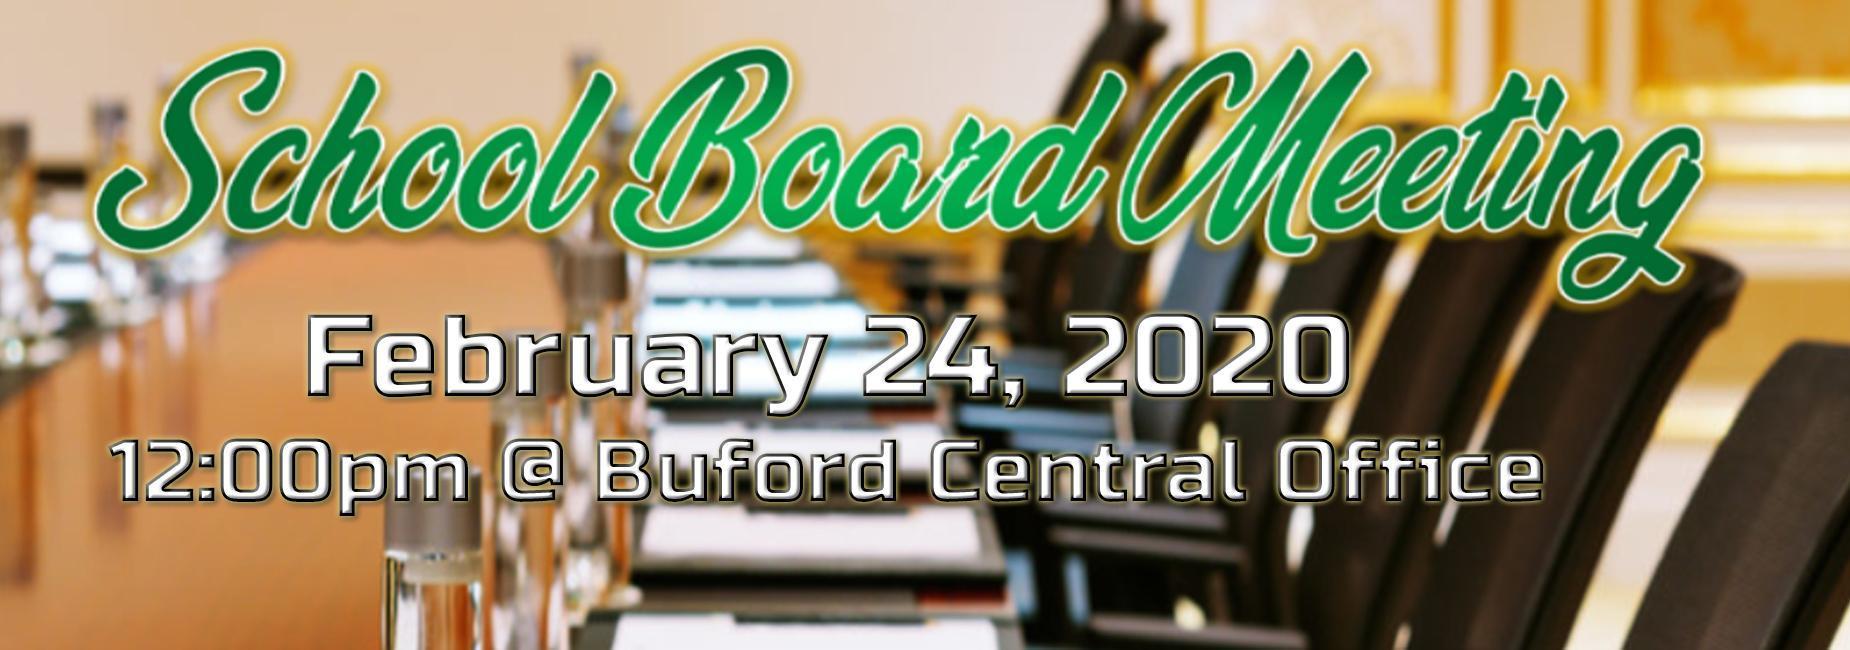 School Board Meeting February 27 at noon.